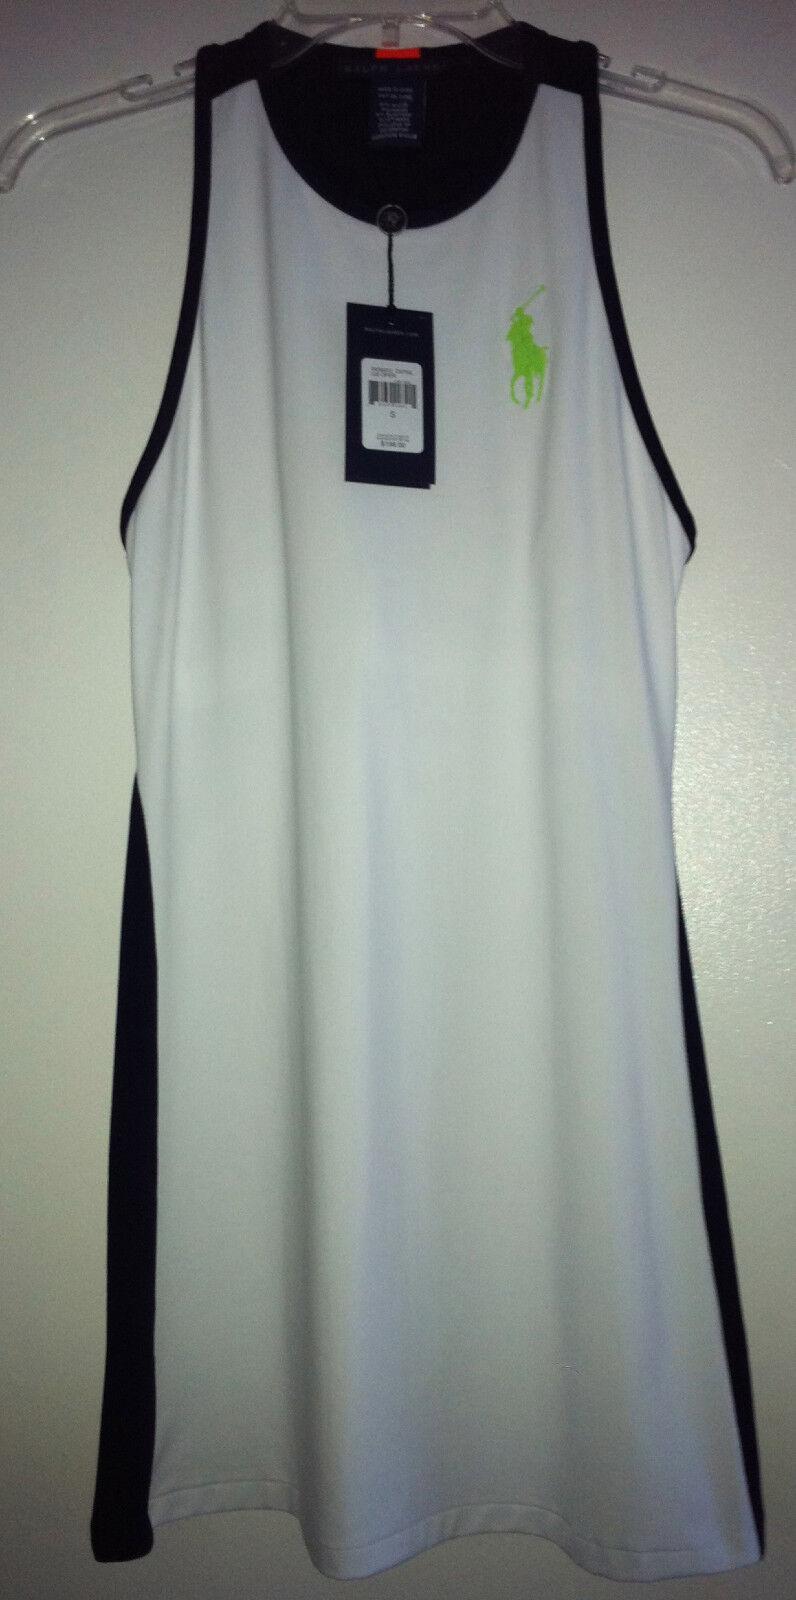 198 NWT Ralph Lauren Tennis Dress US Open White Navy bluee M XL Big Pony RL New